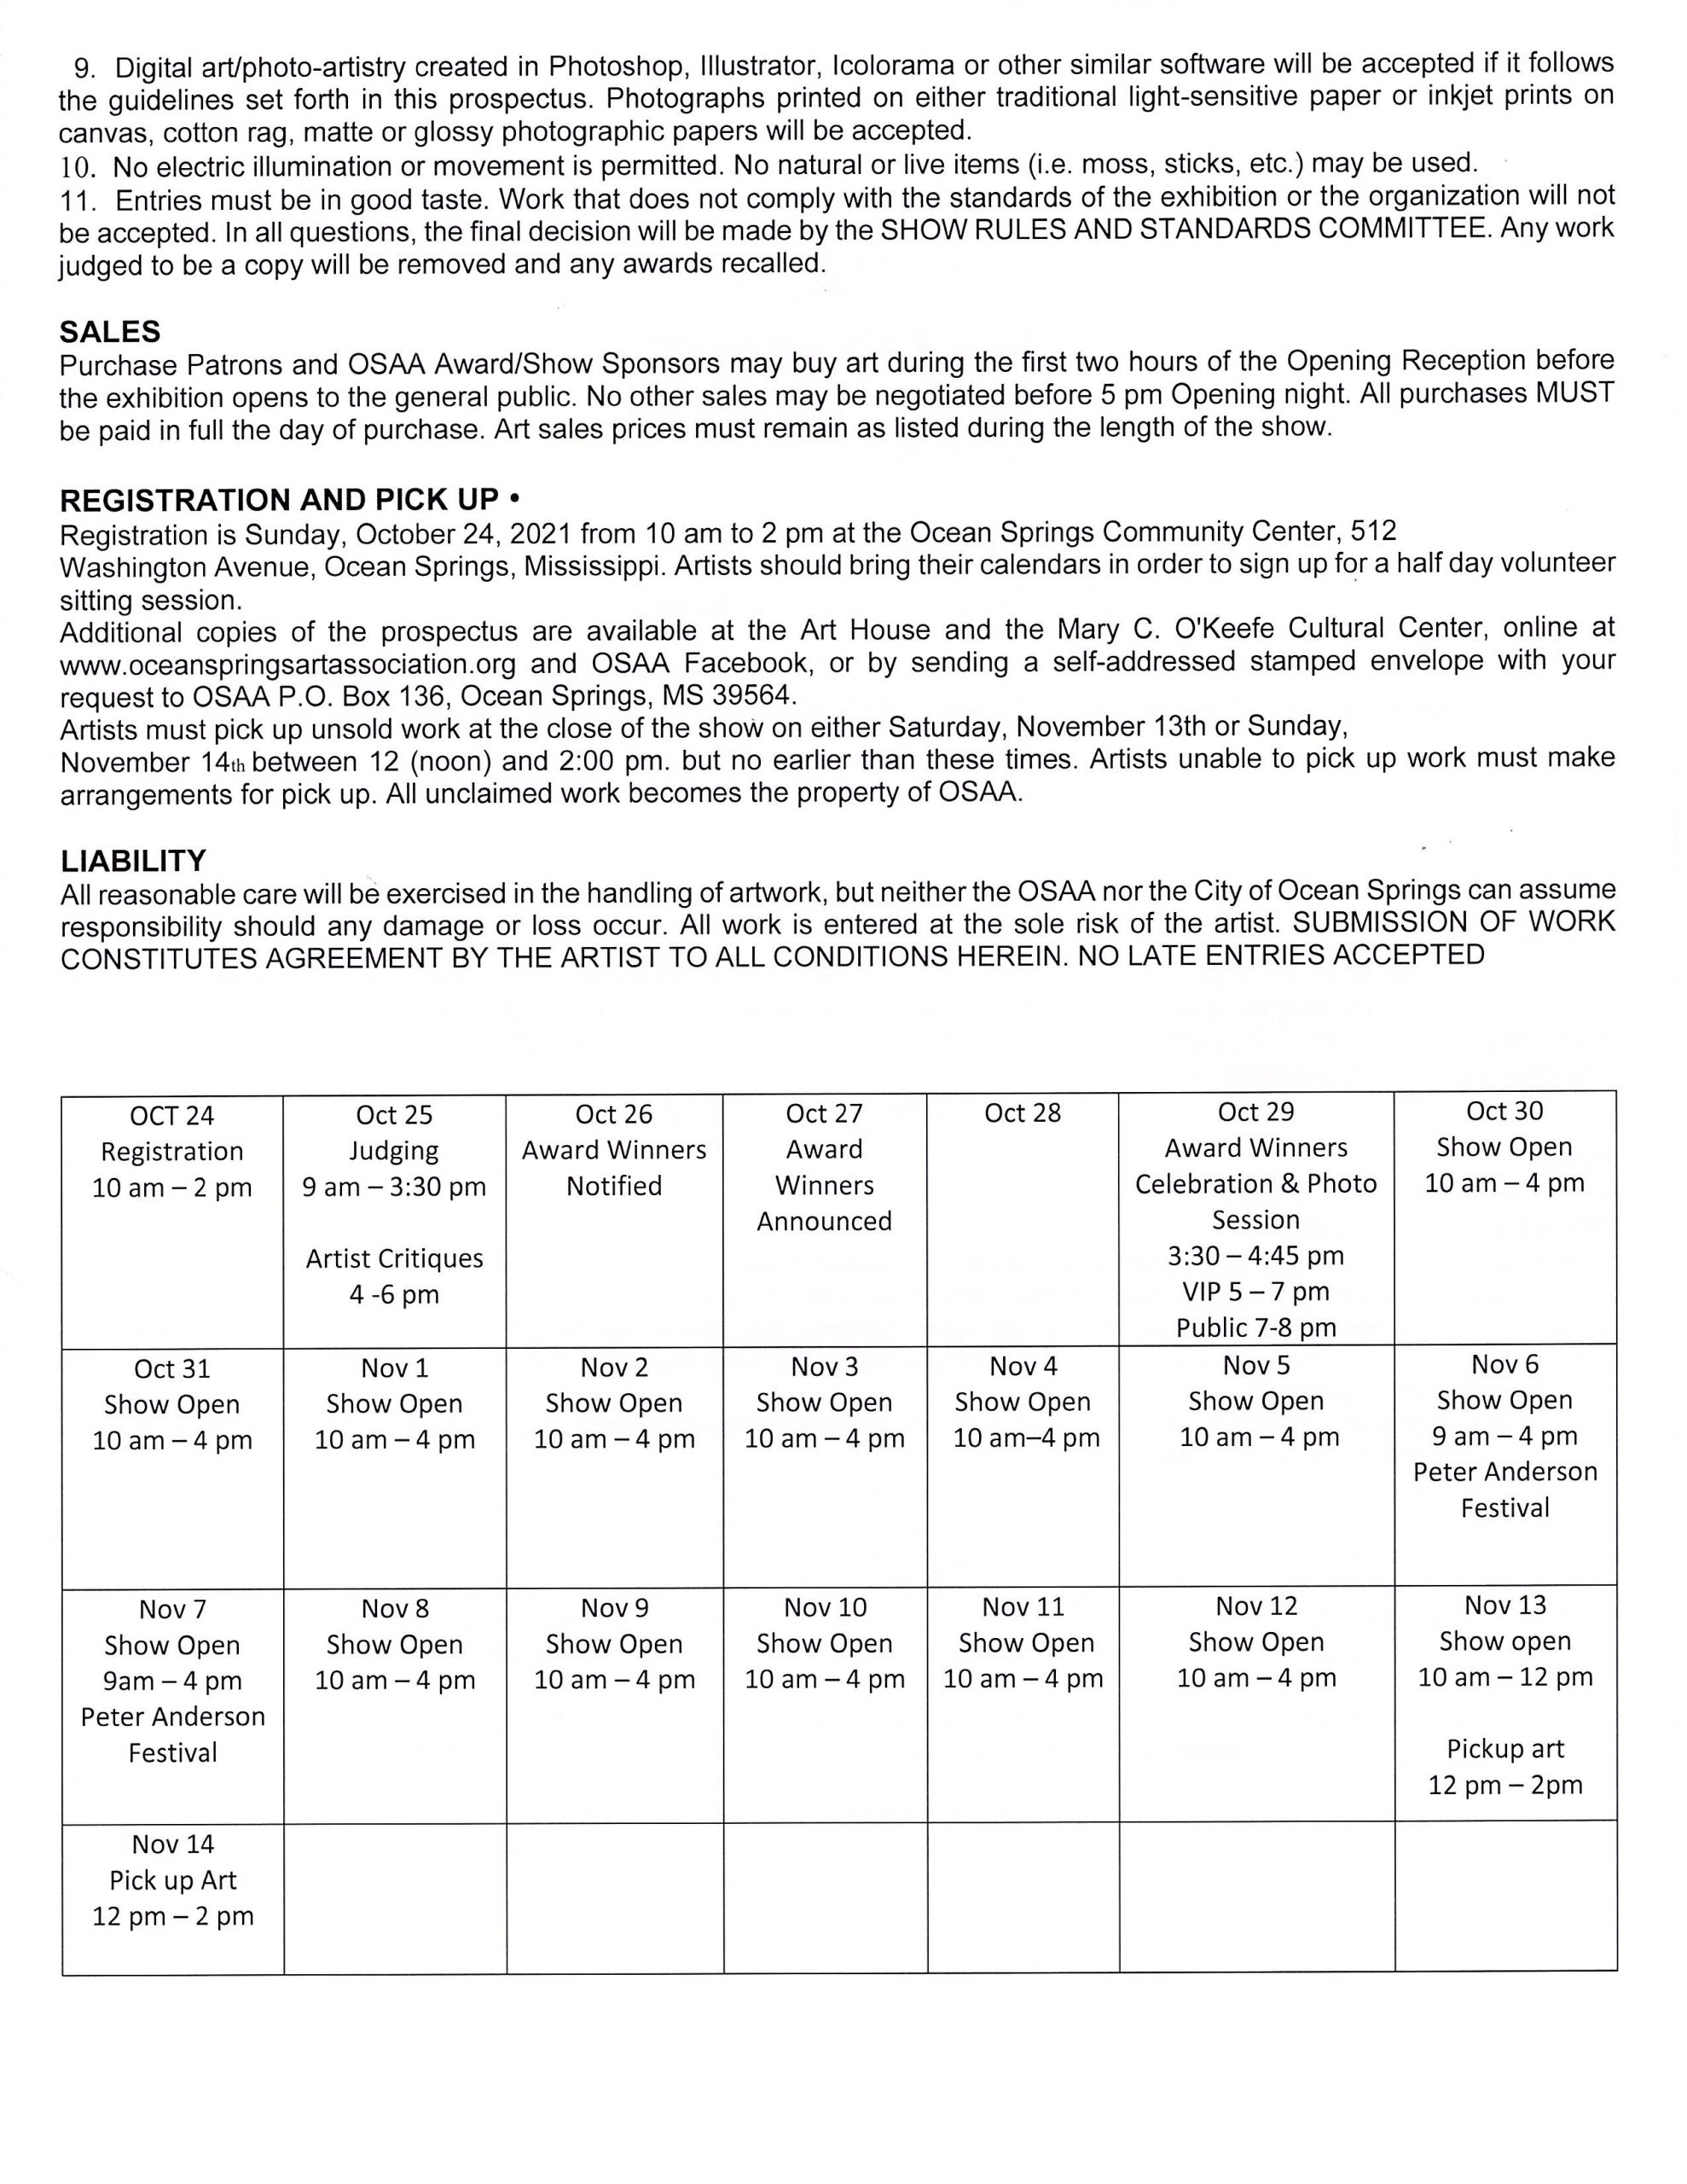 Partake Prospectus Page 2